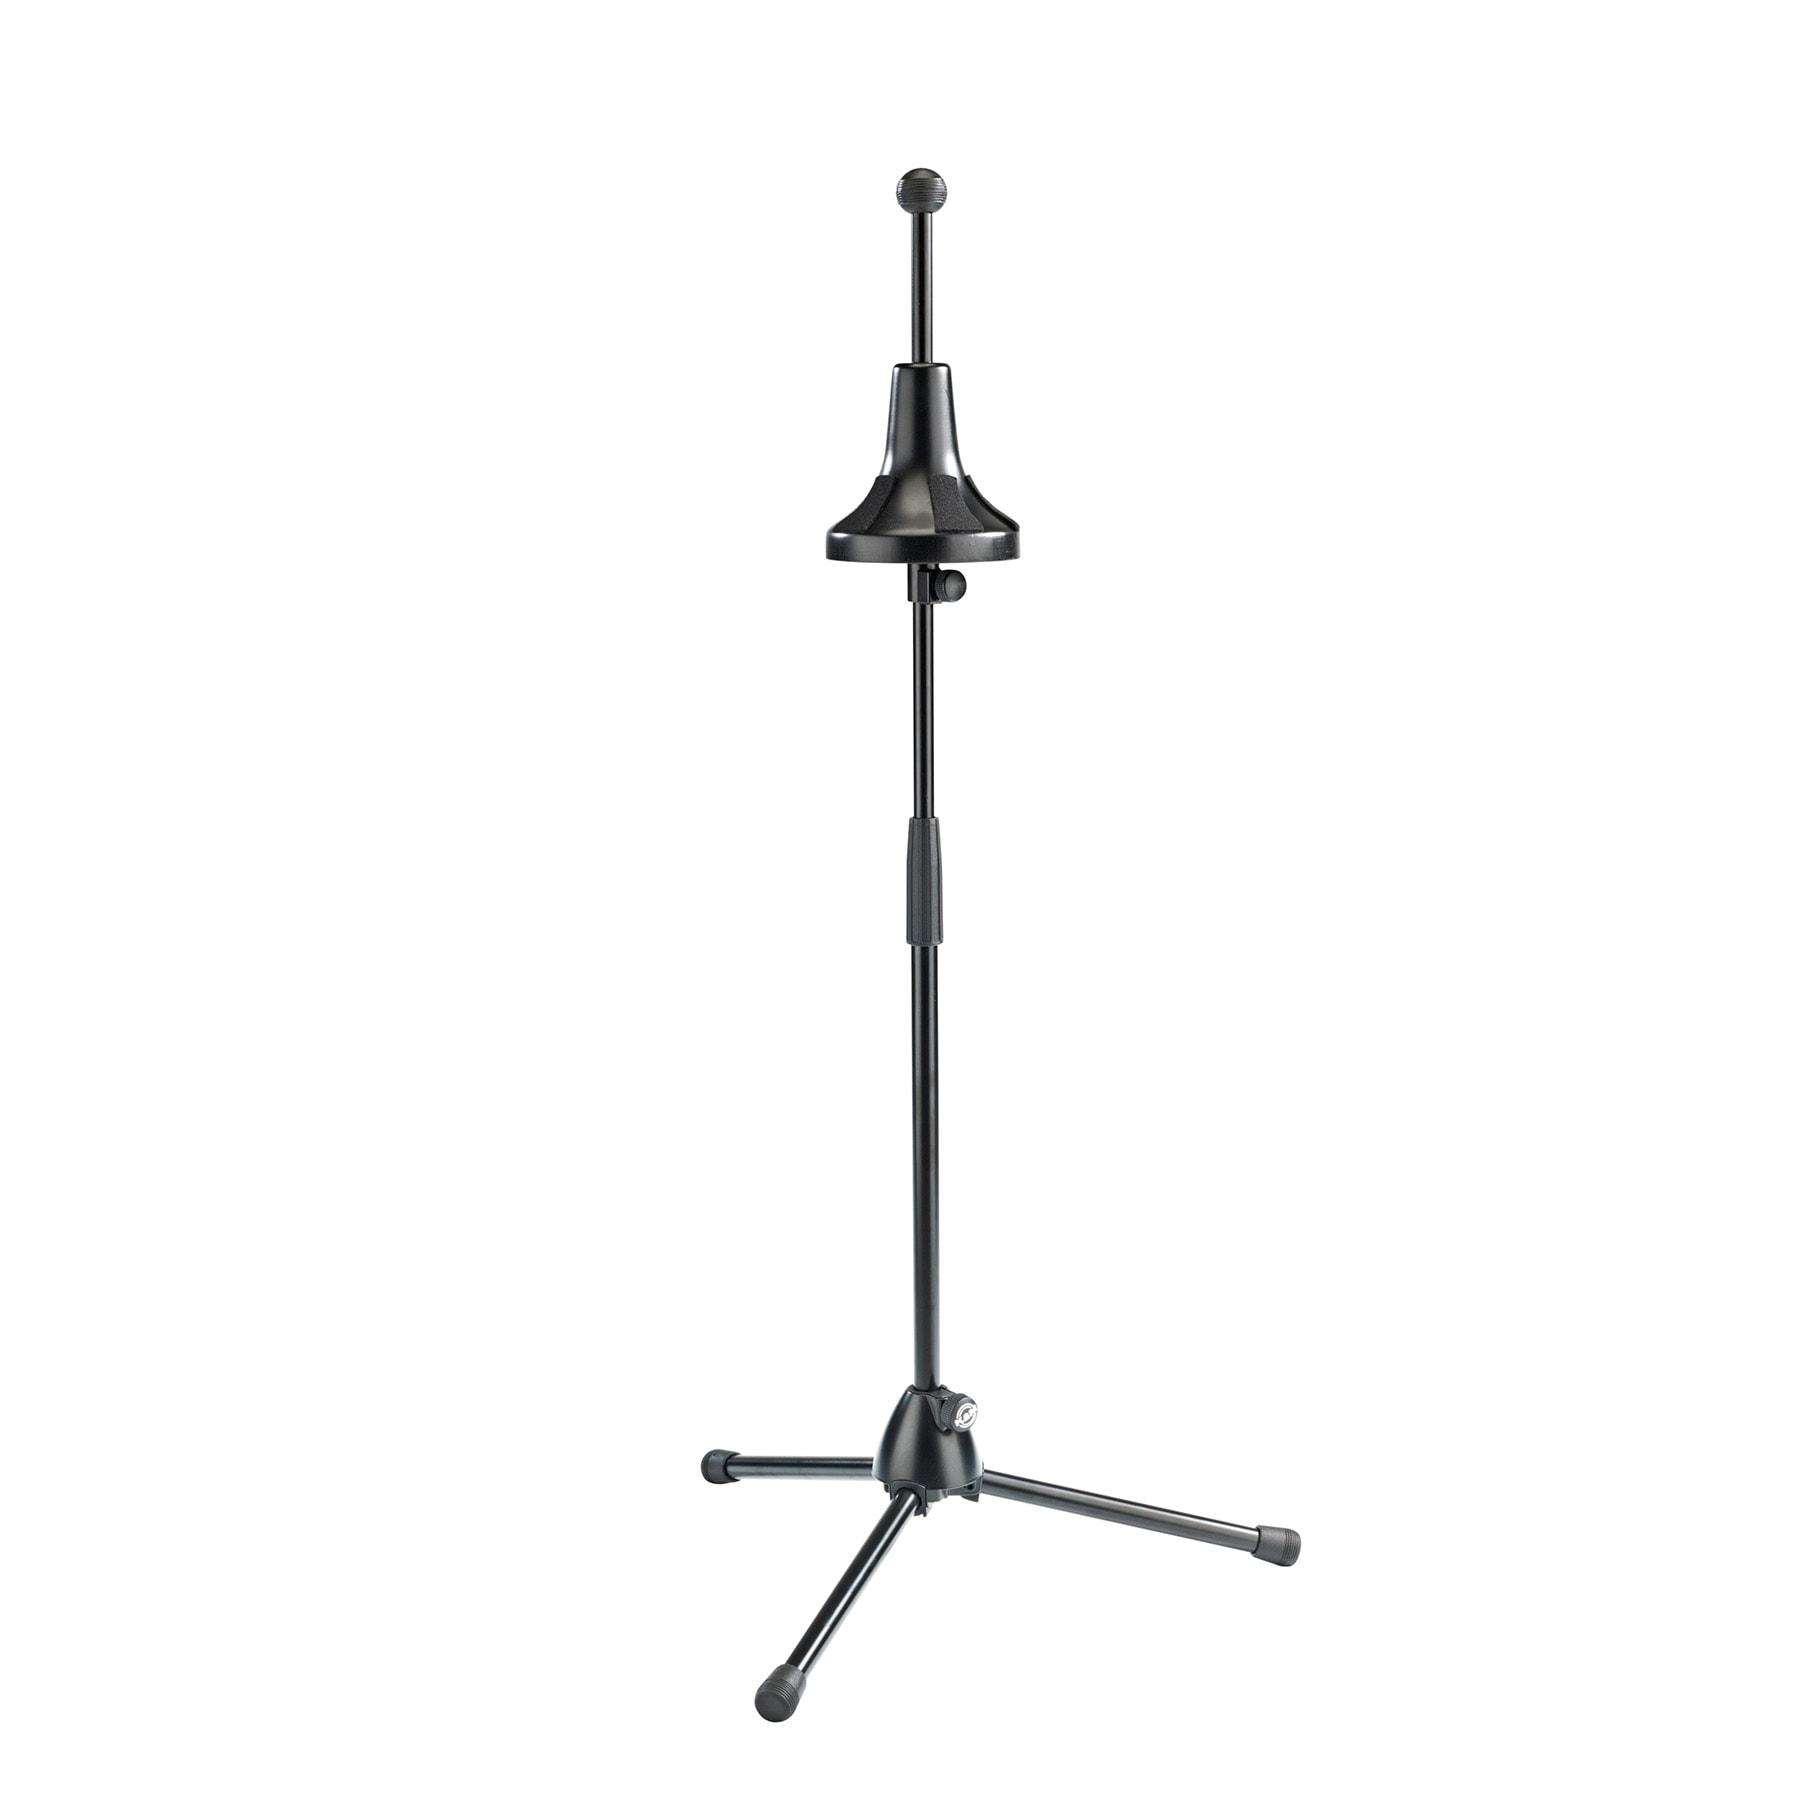 KM14910 - Bass trombone stand